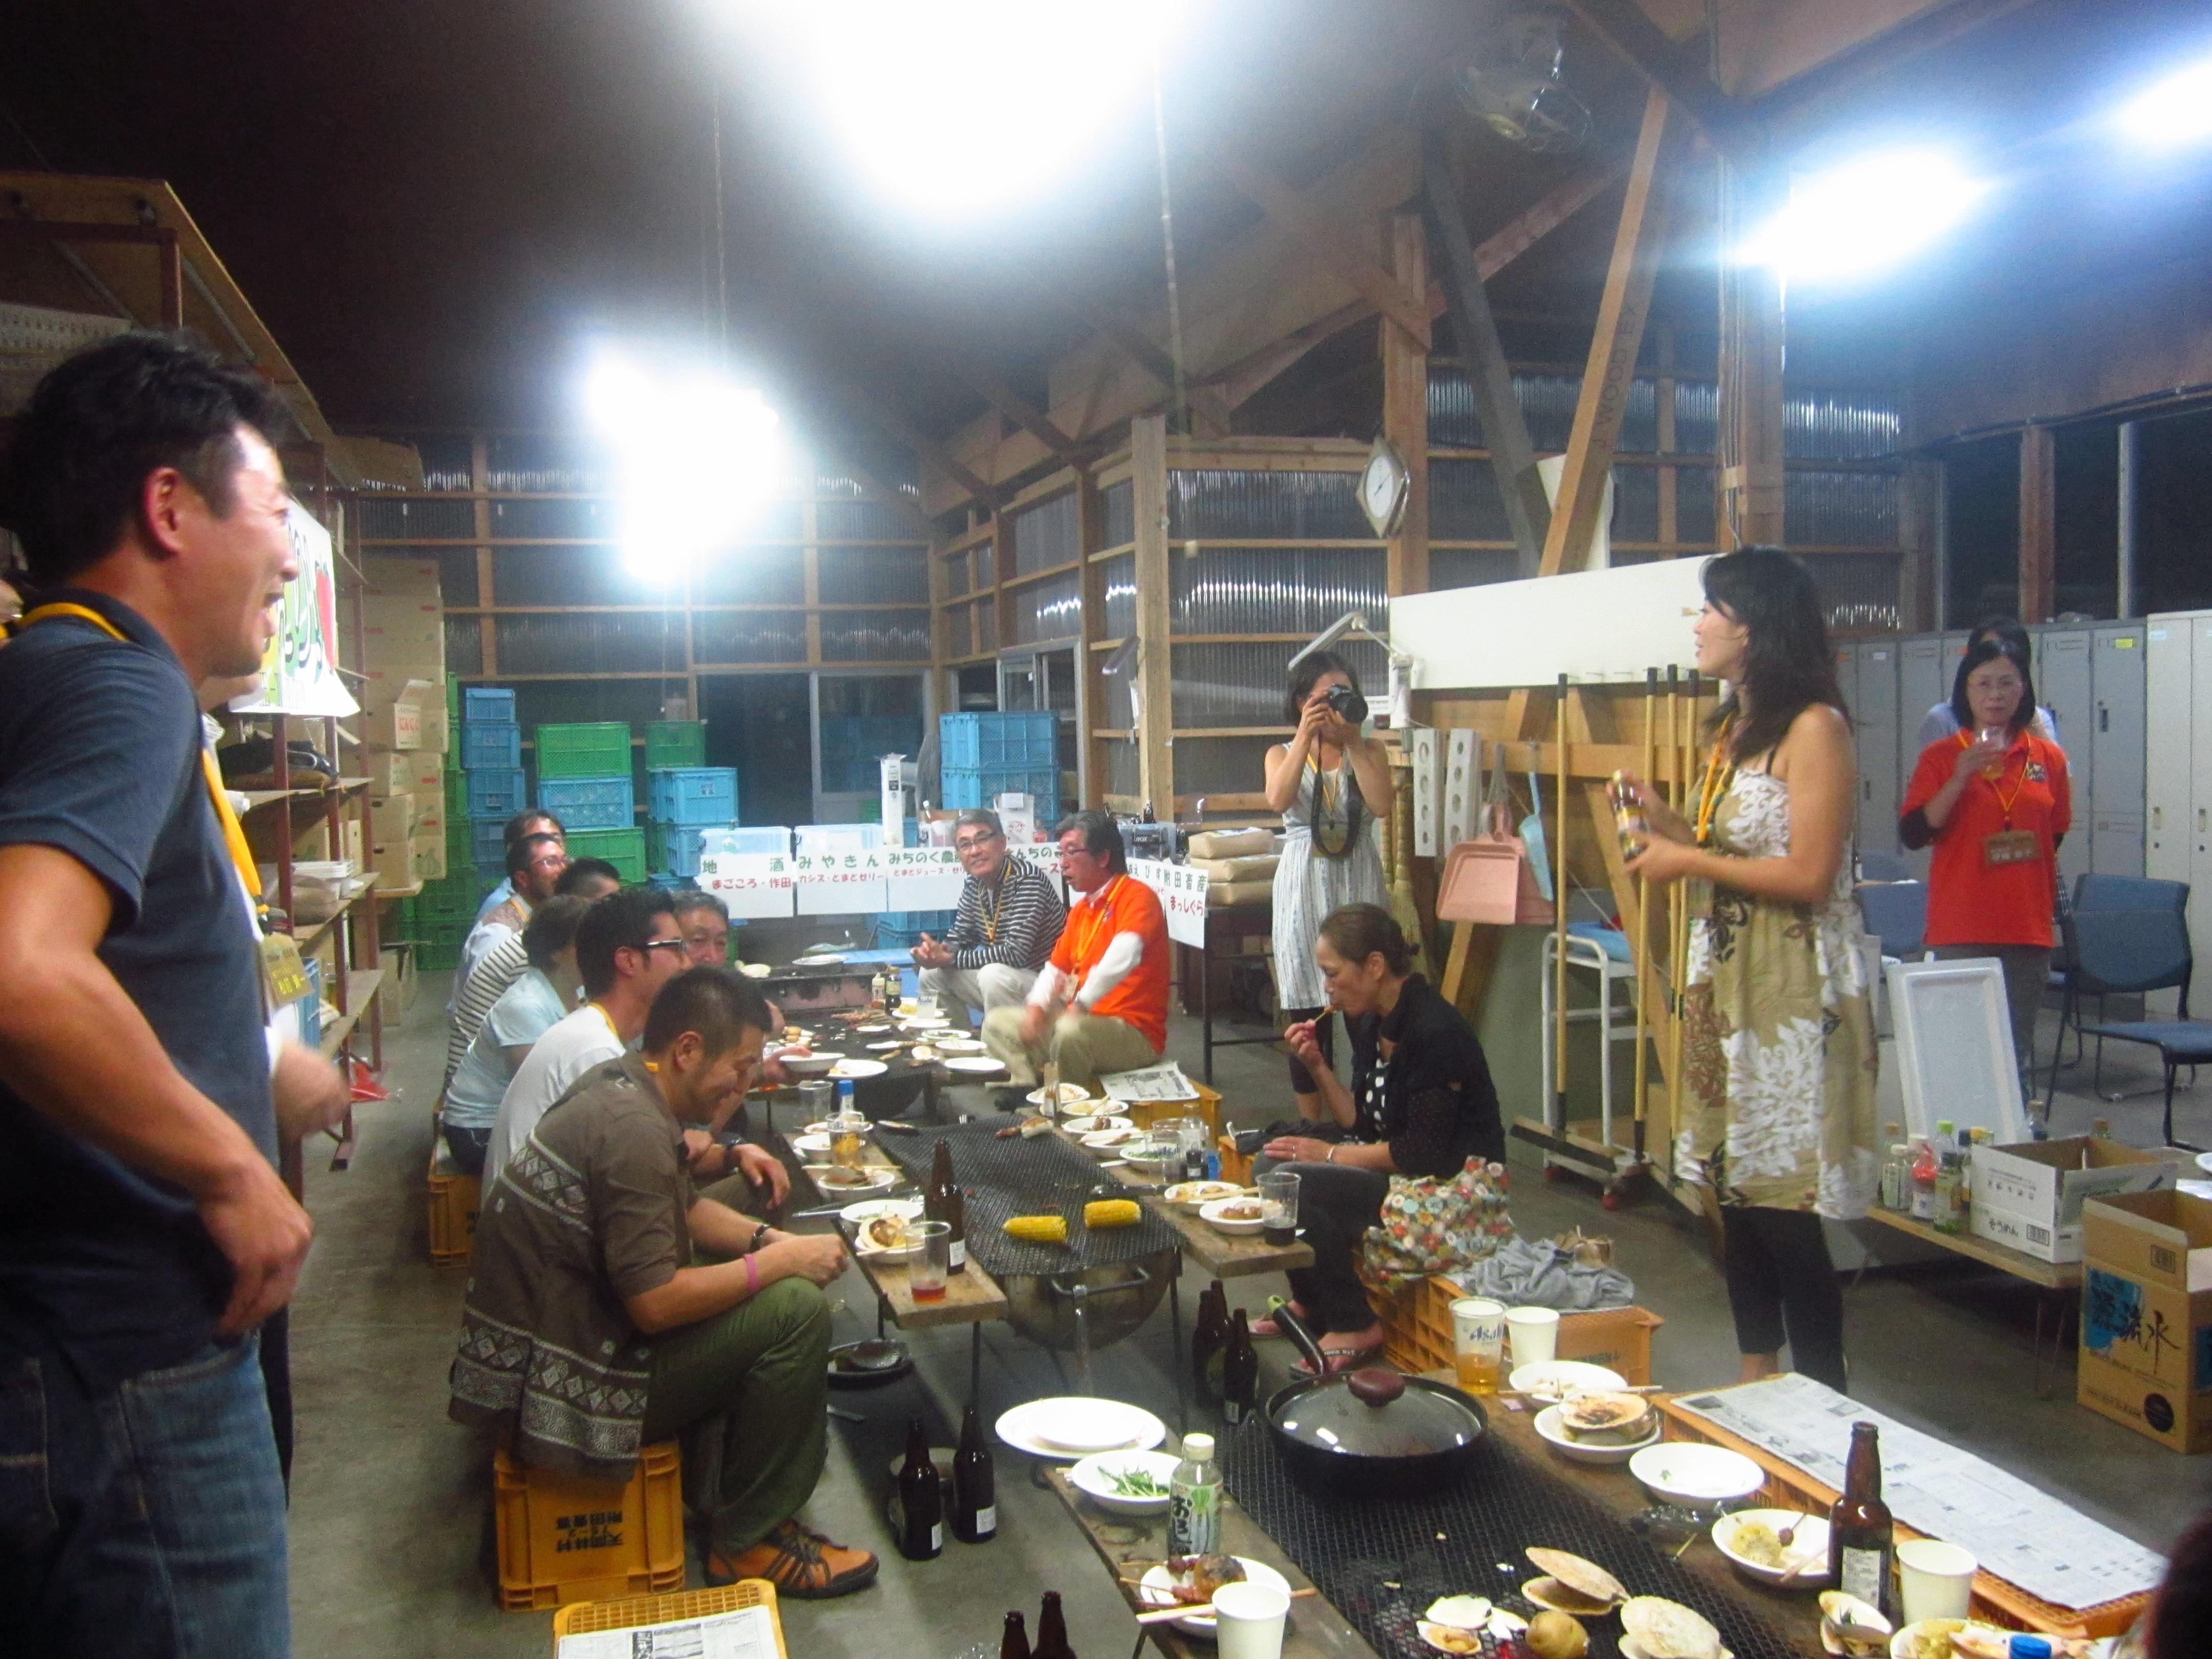 IMG 4307 - 麻布十番納涼祭り25,26日(七戸町出店)